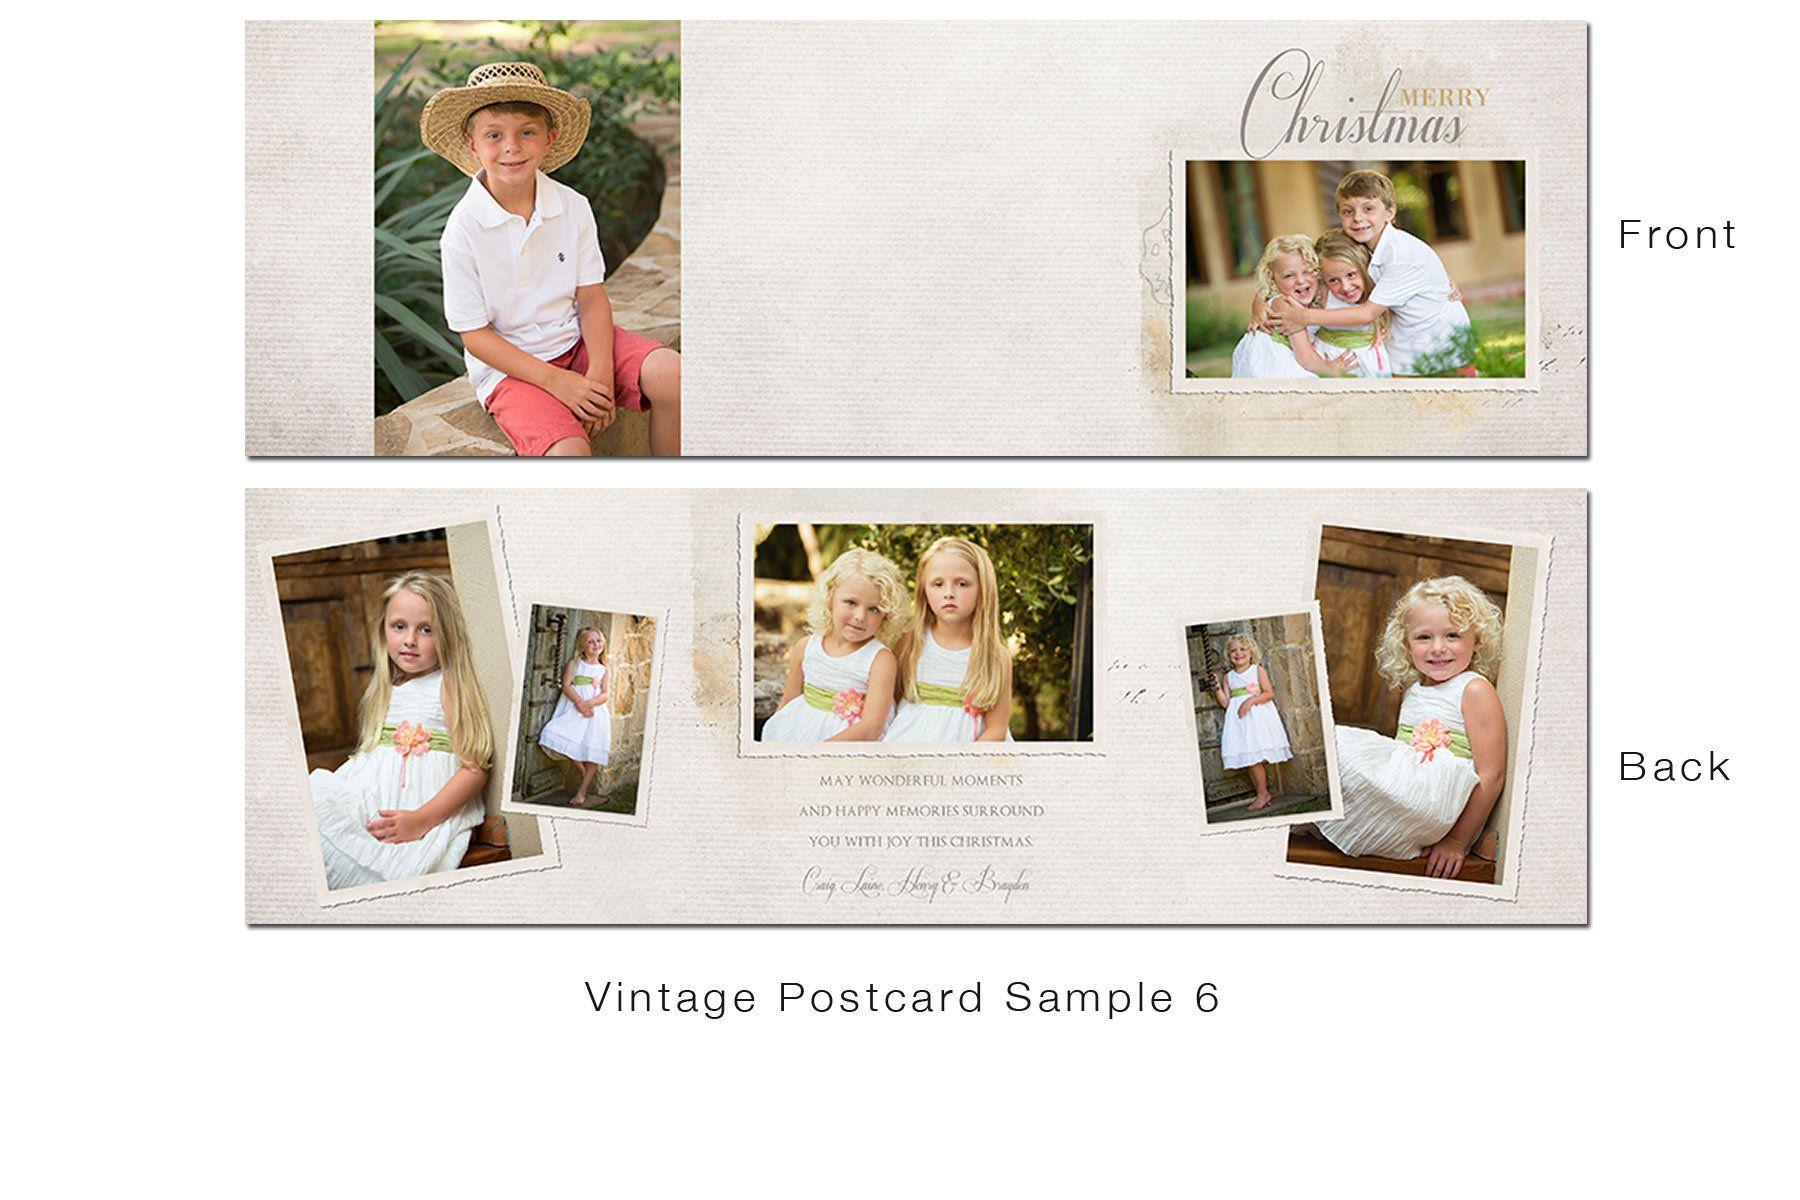 1vintage_postcard_sample_6.jpg